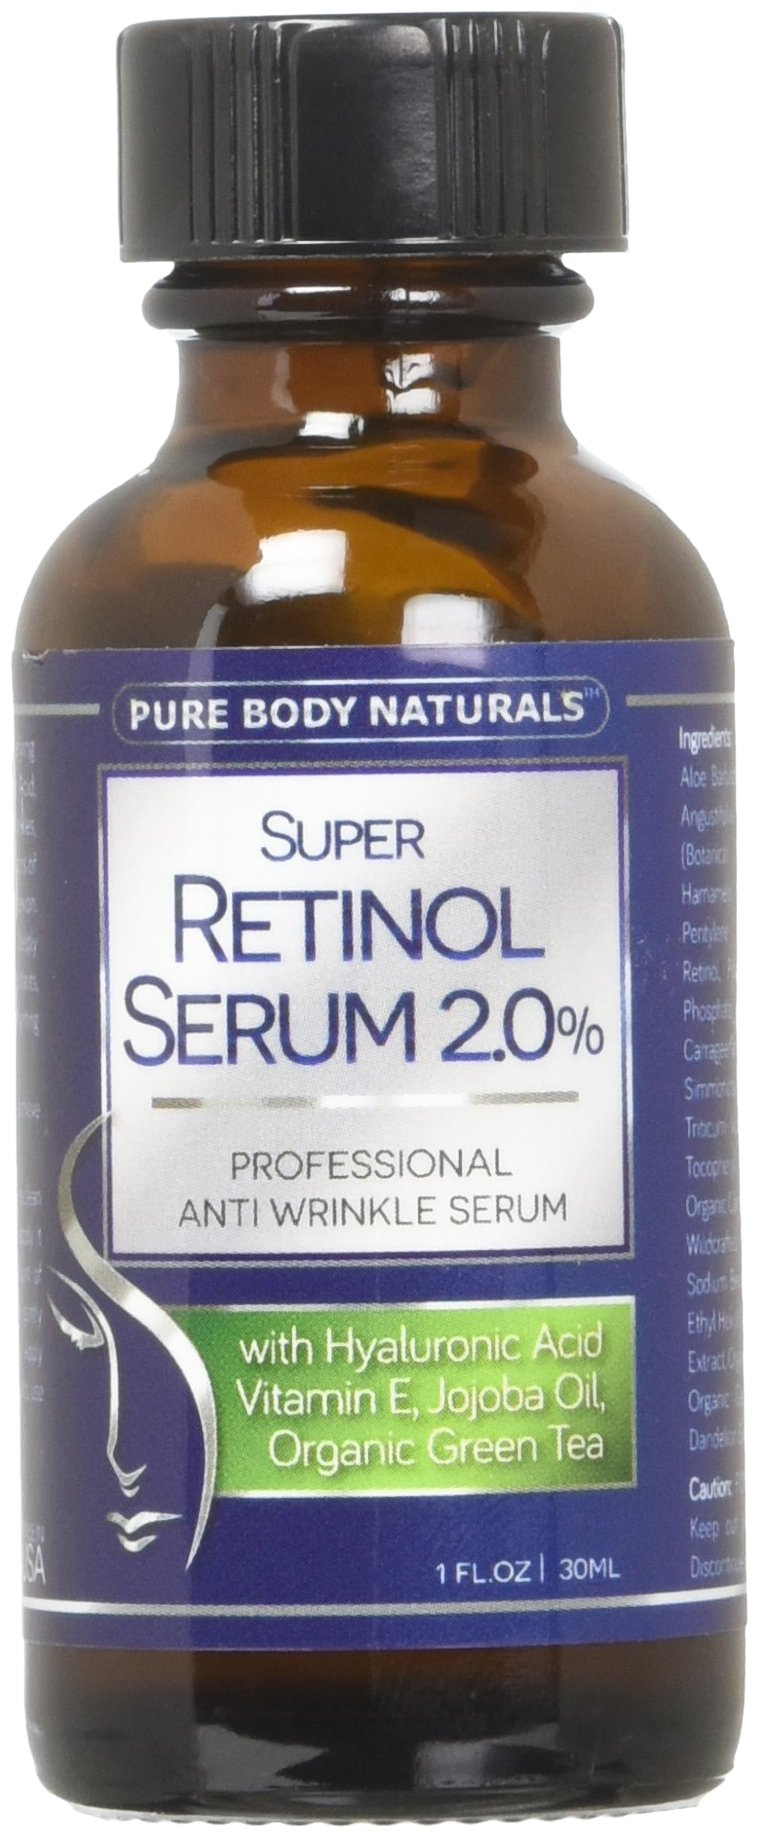 Pure Body Naturals 2% Retinol Face Serum with Hyaluronic Acid, Vitamin E, Jojoba Oil and Organic Green Tea, 1 Fl Oz